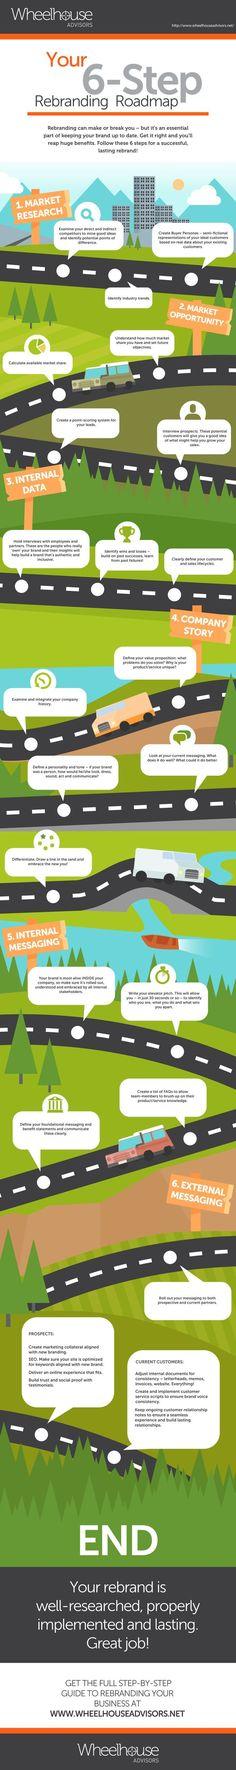 Your Six Step Rebranding Roadmap #Infographic #Business #Branding